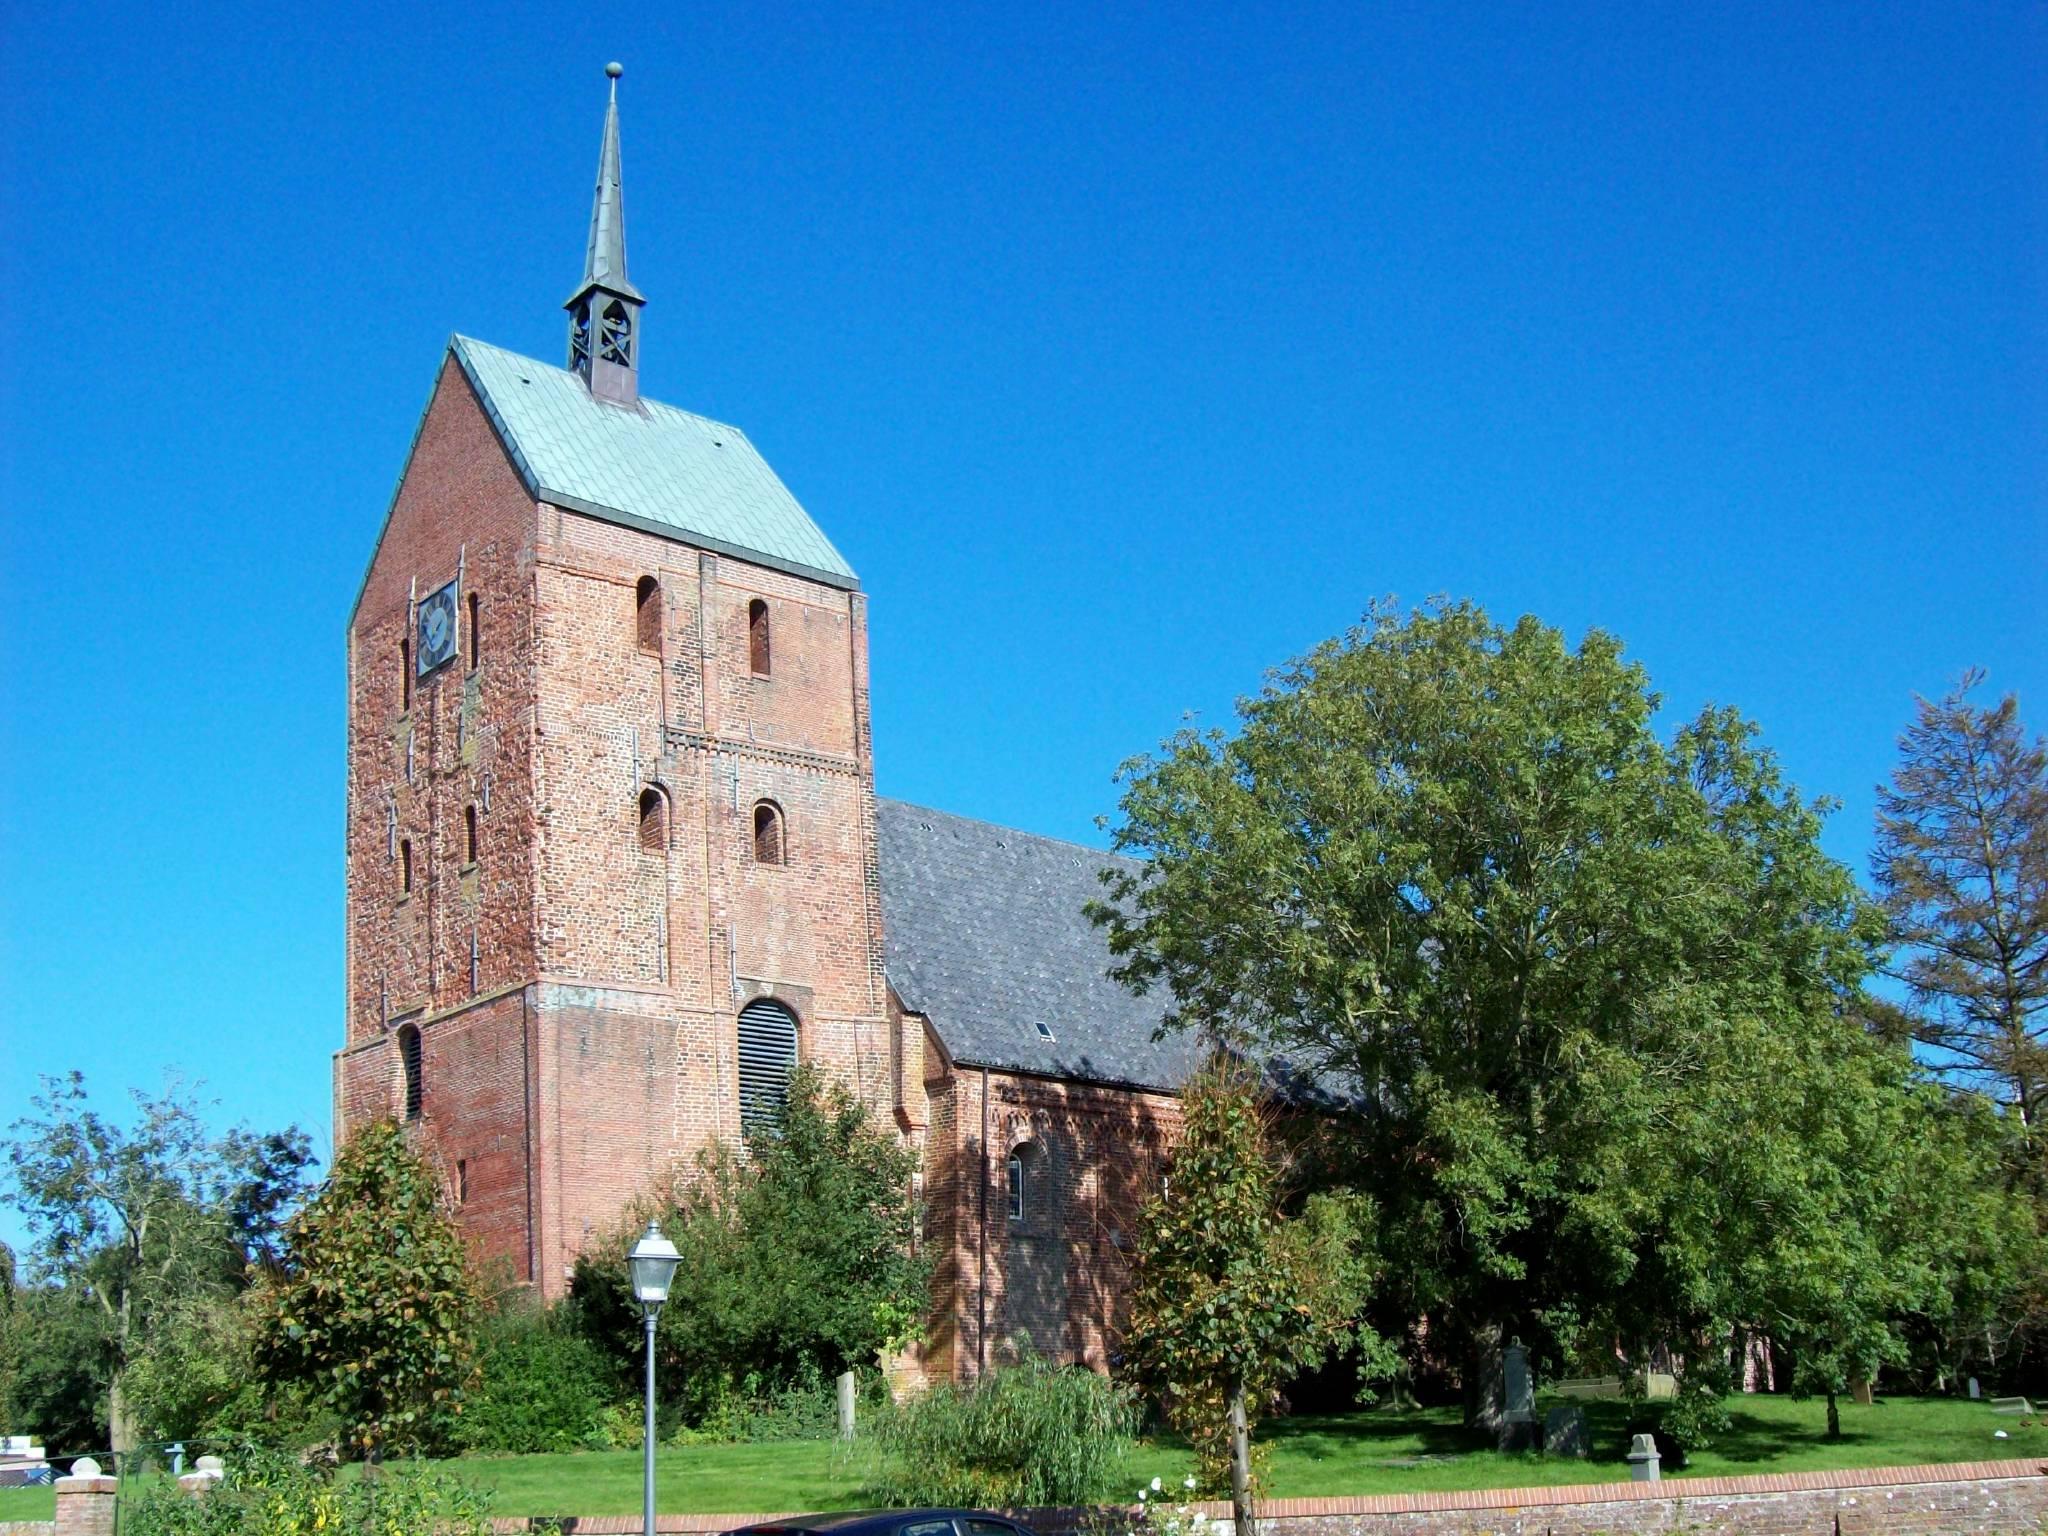 Ansgari Kirche in Hage